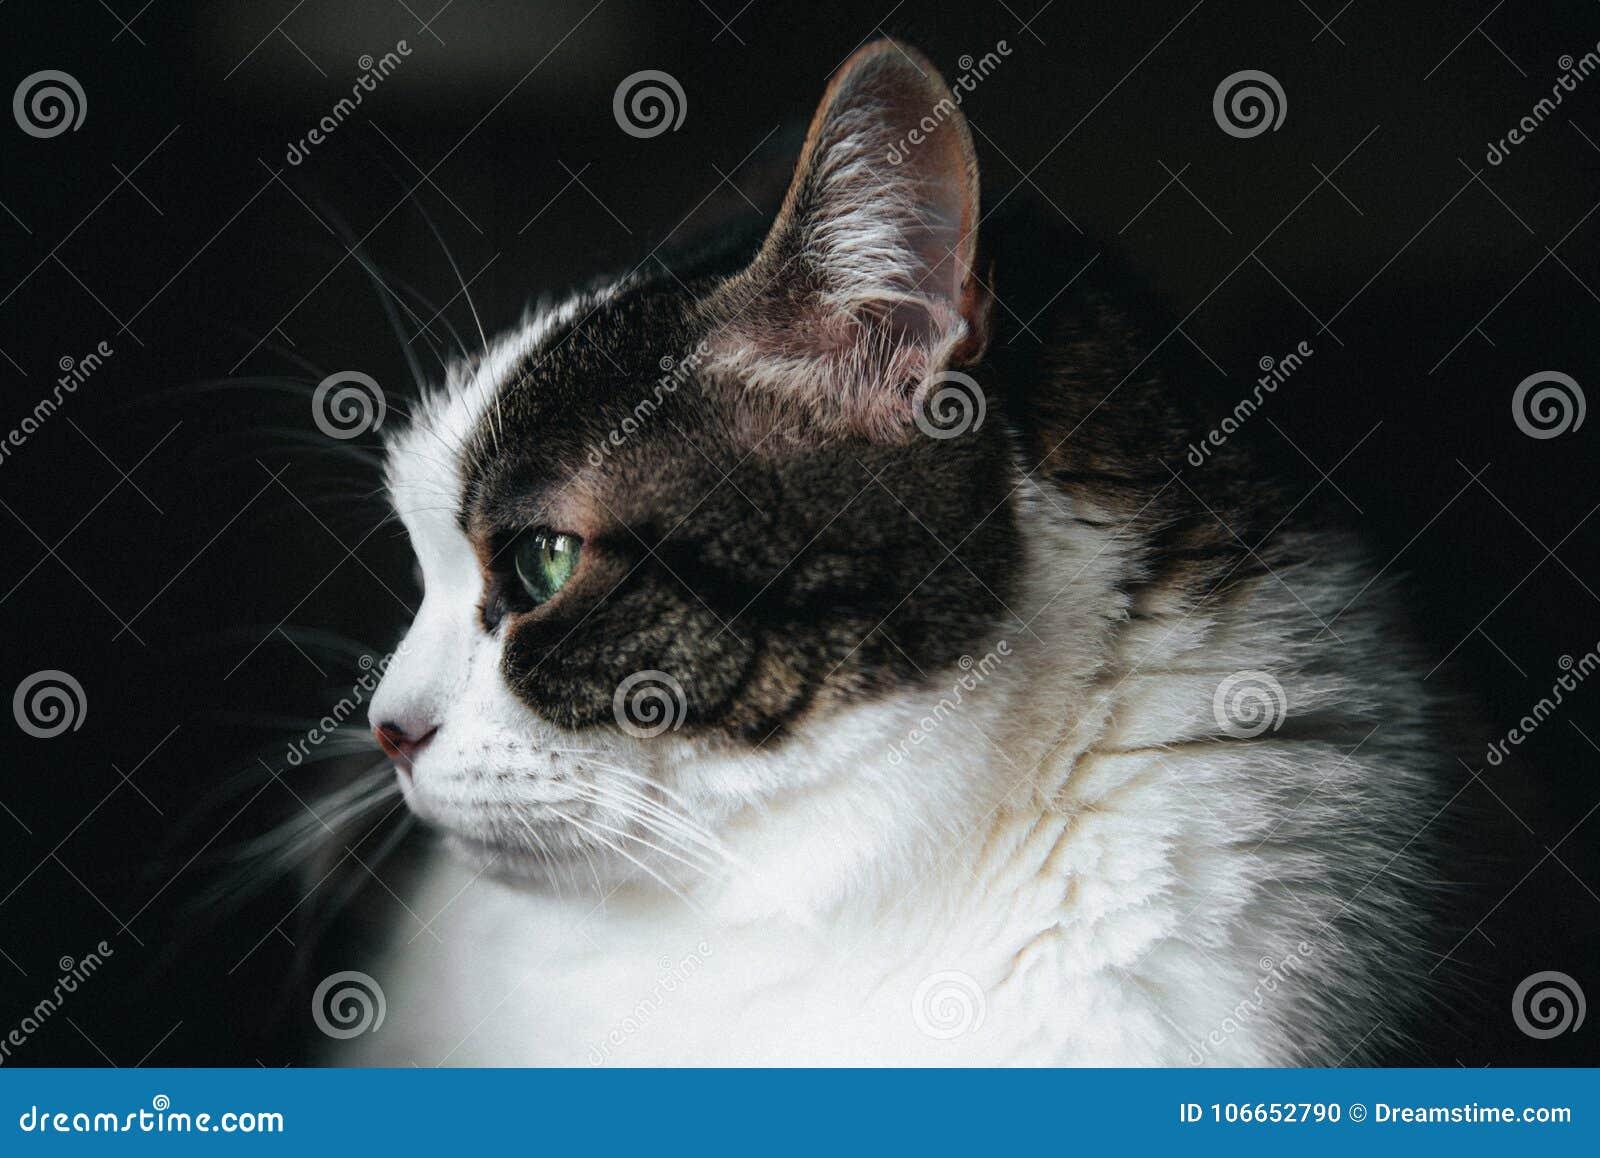 Haariges weißes Katzengrün gemustert